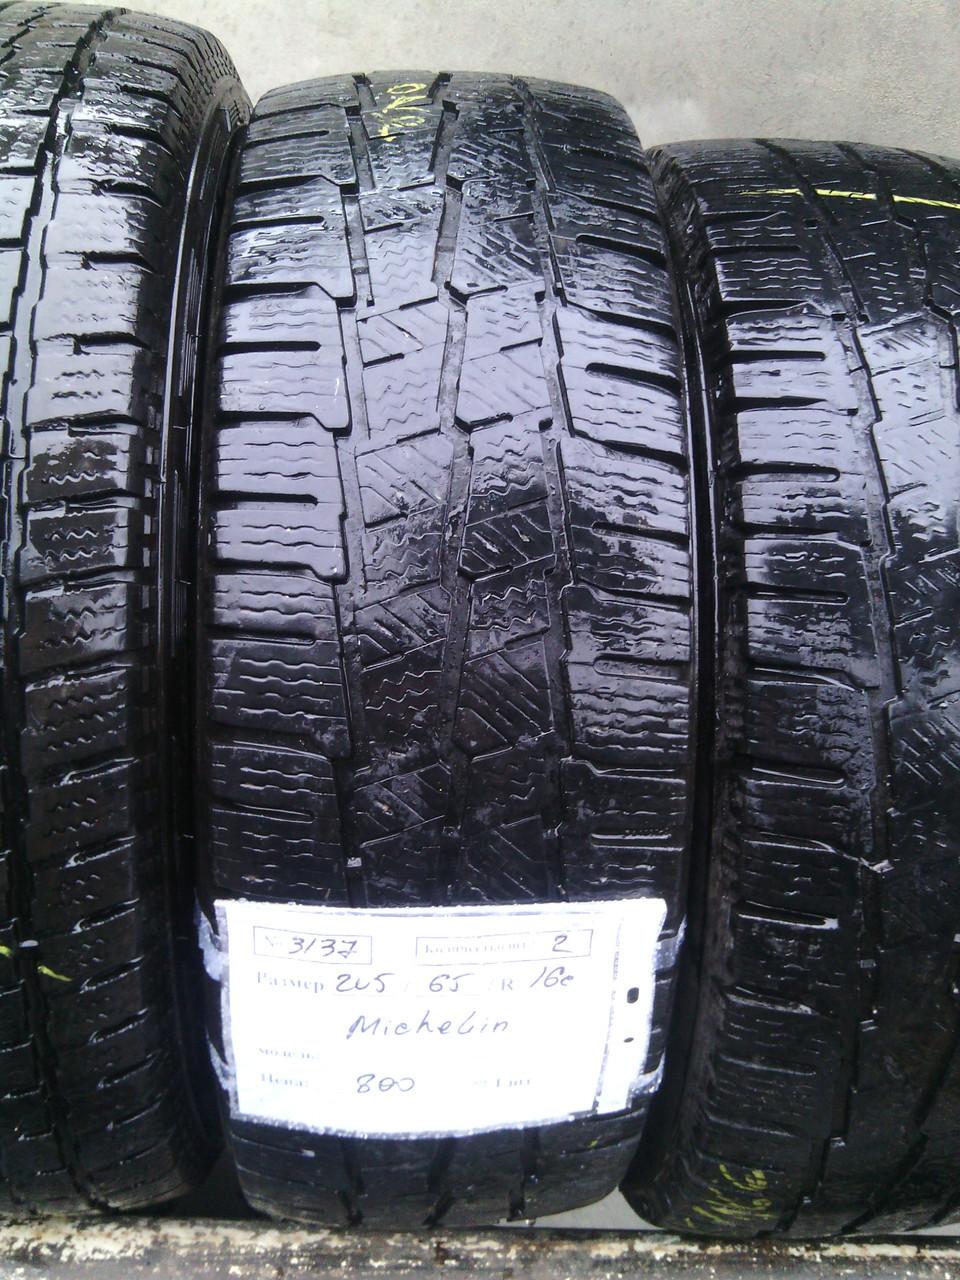 Шины б.у. 205.65.r16с Michelin Agilis 51 Мишлен. Резина бу для микроавтобусов. Автошина усиленная. Цешка